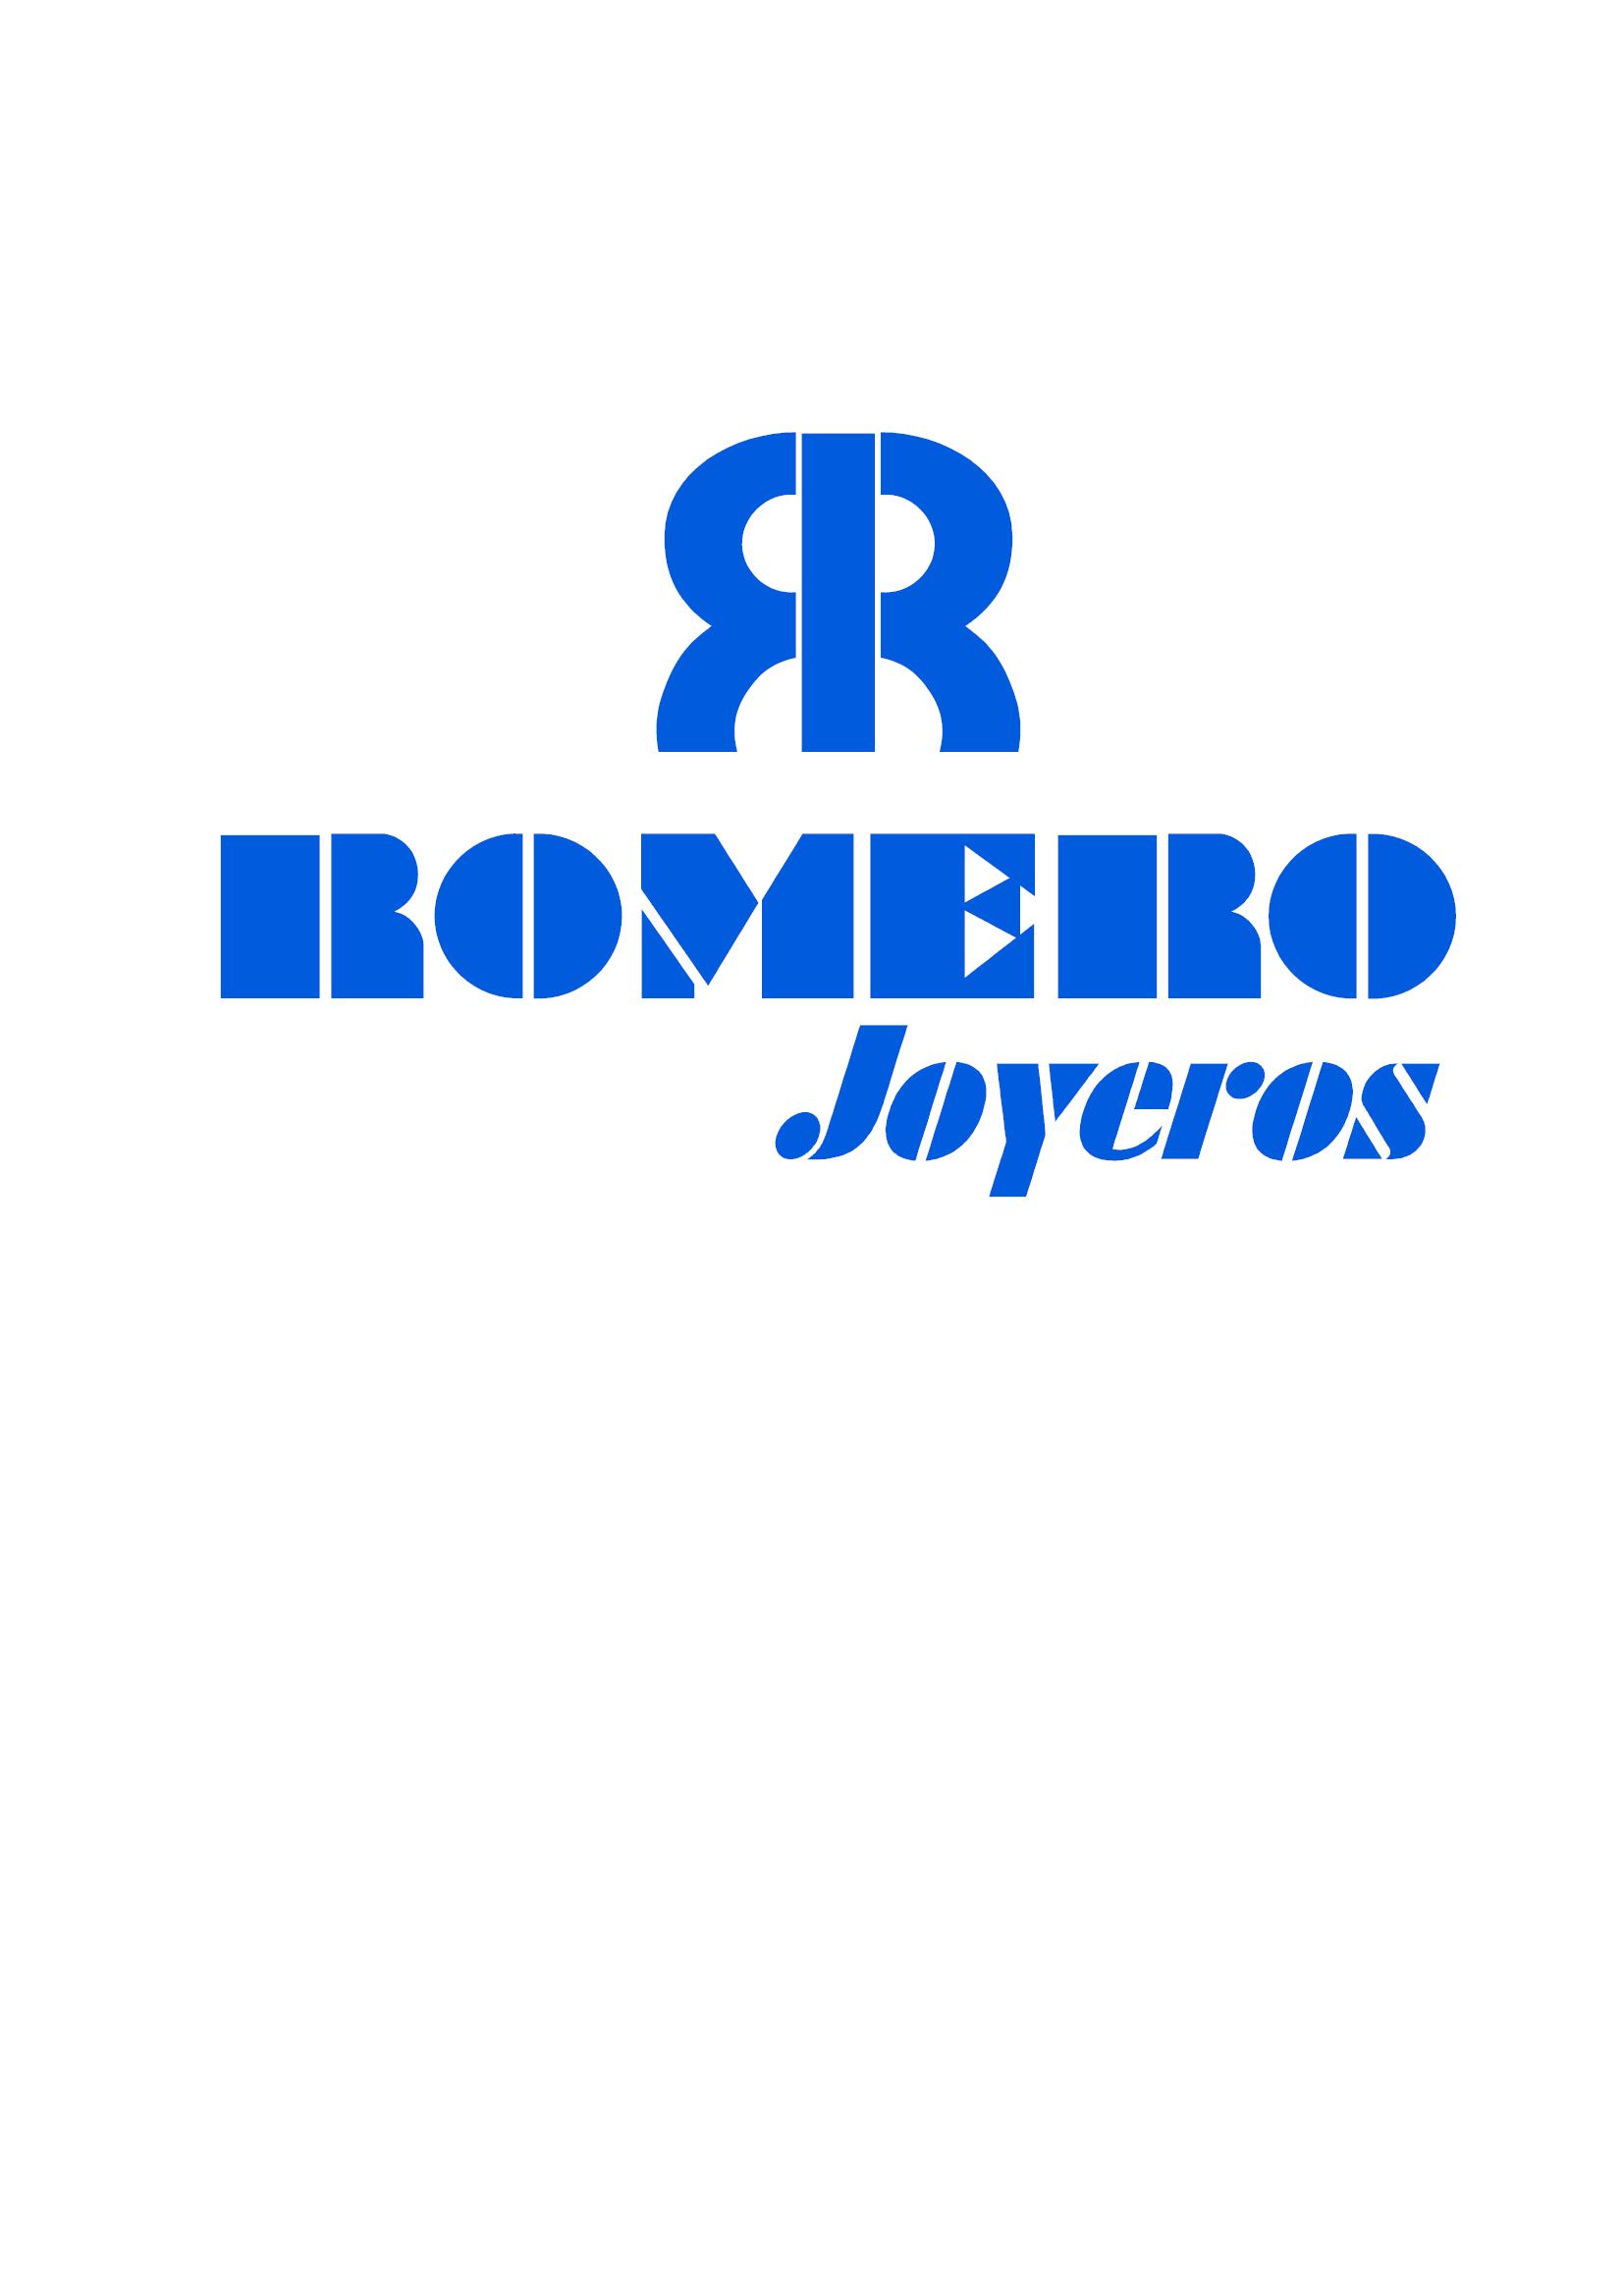 LOGO-ROMERO-JOYEROSpng